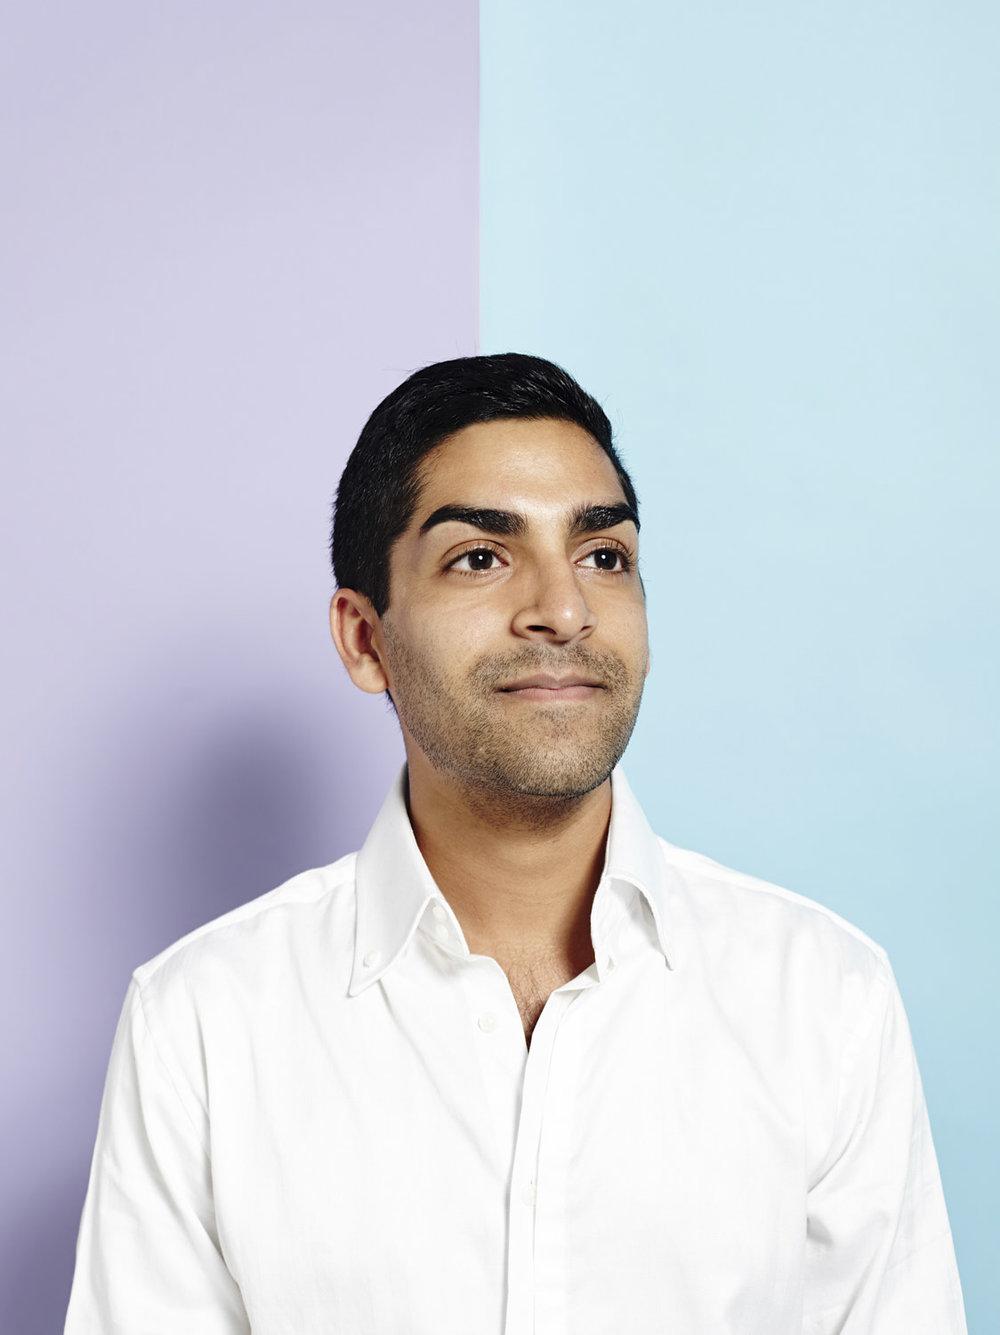 Sahil Jain/Refinery 29's 30 under 30